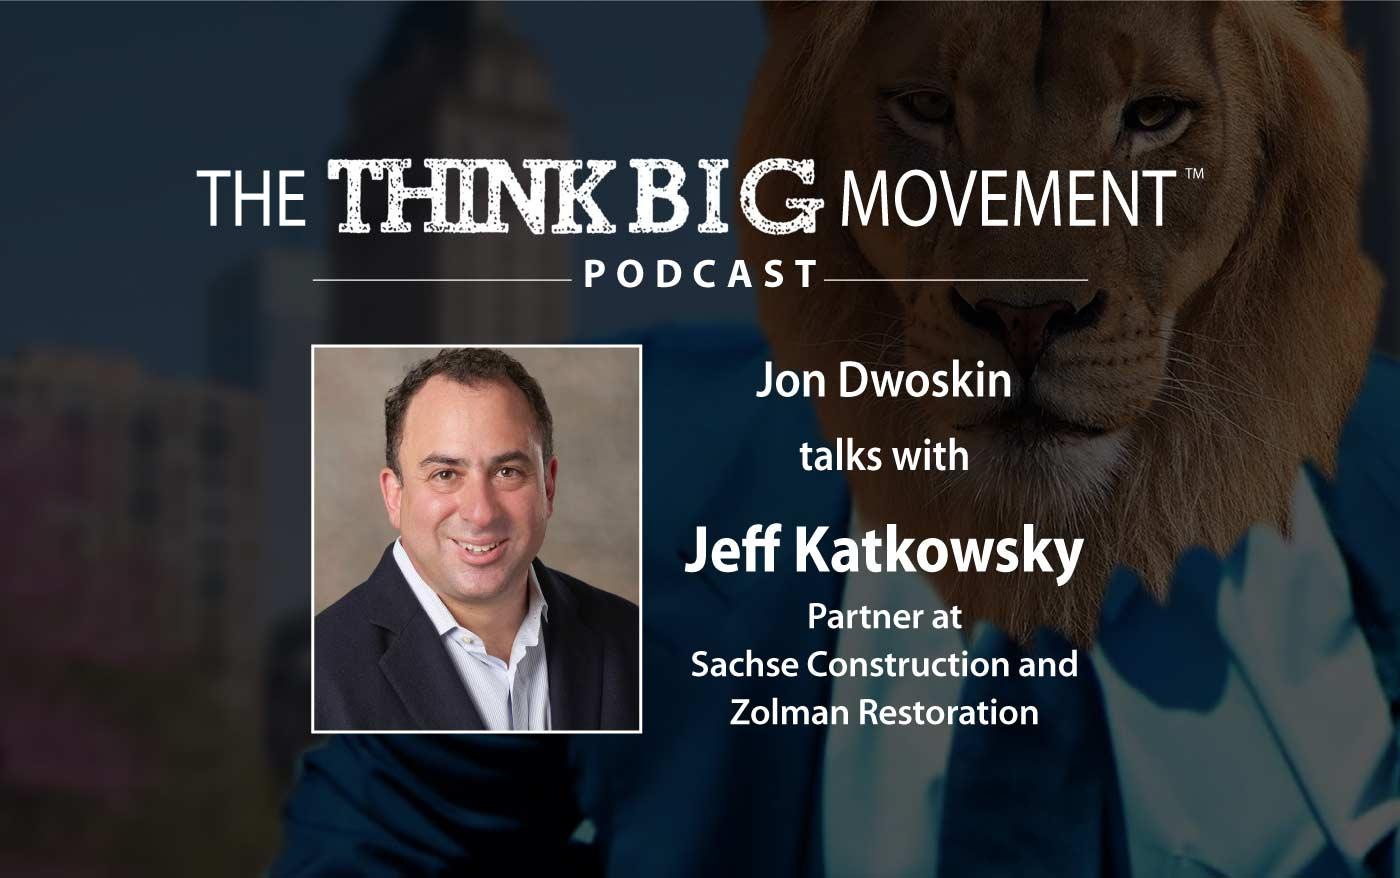 Jon Dwoskin Interviews Jeff Katkowsky Partner At Sachse